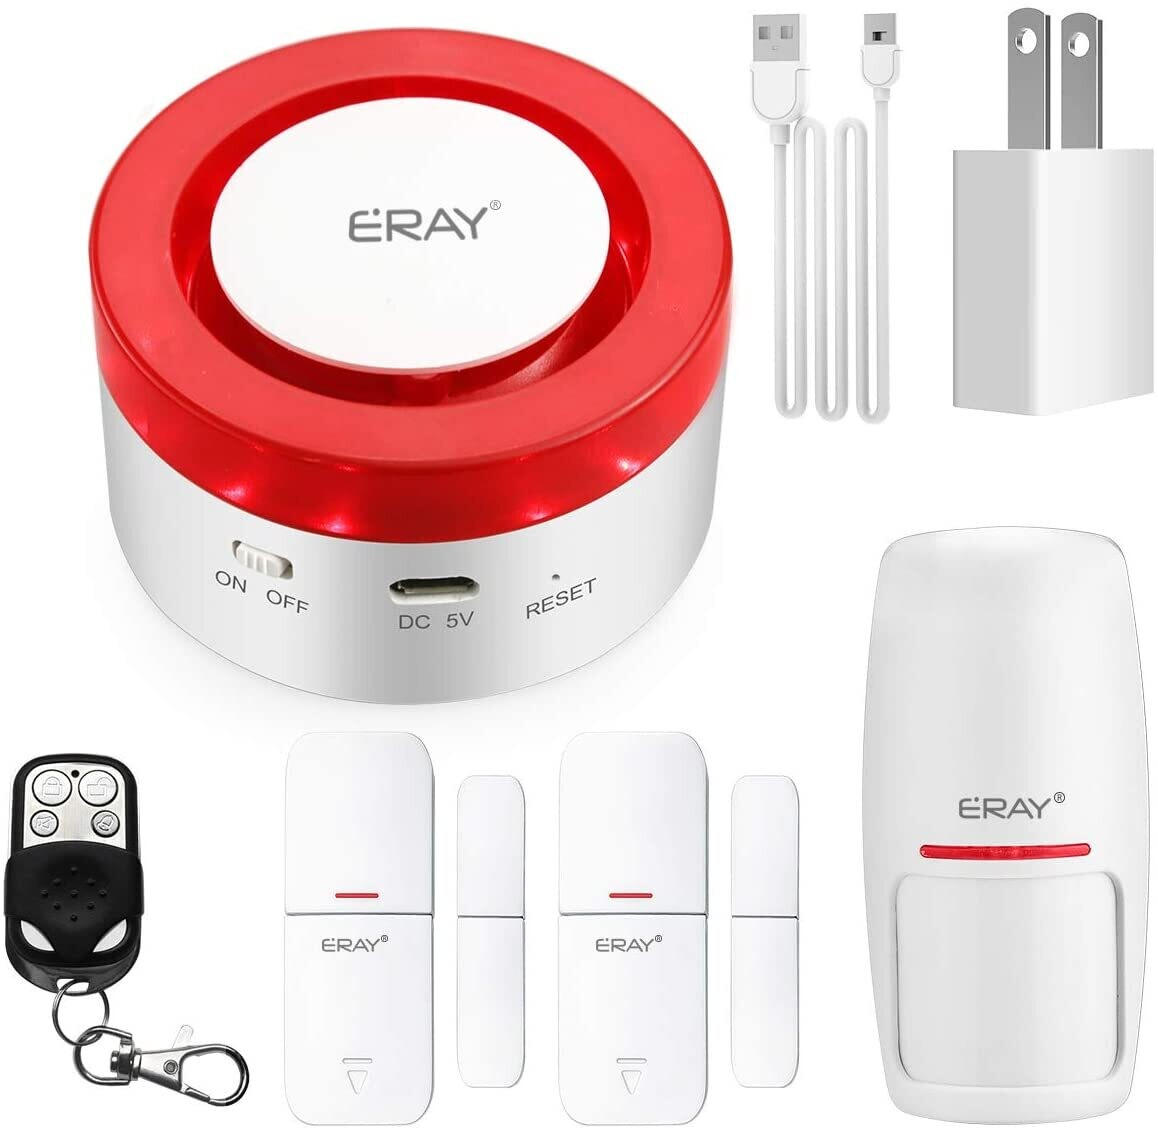 TUYA Smart Home Security Alarm Siren System, ERAY T1 Wireless WiFi Burglar Siren Alarms, Compatible with Alexa and Google Assistant/APP Alarm Push/Custom-Named/Timing Setting.